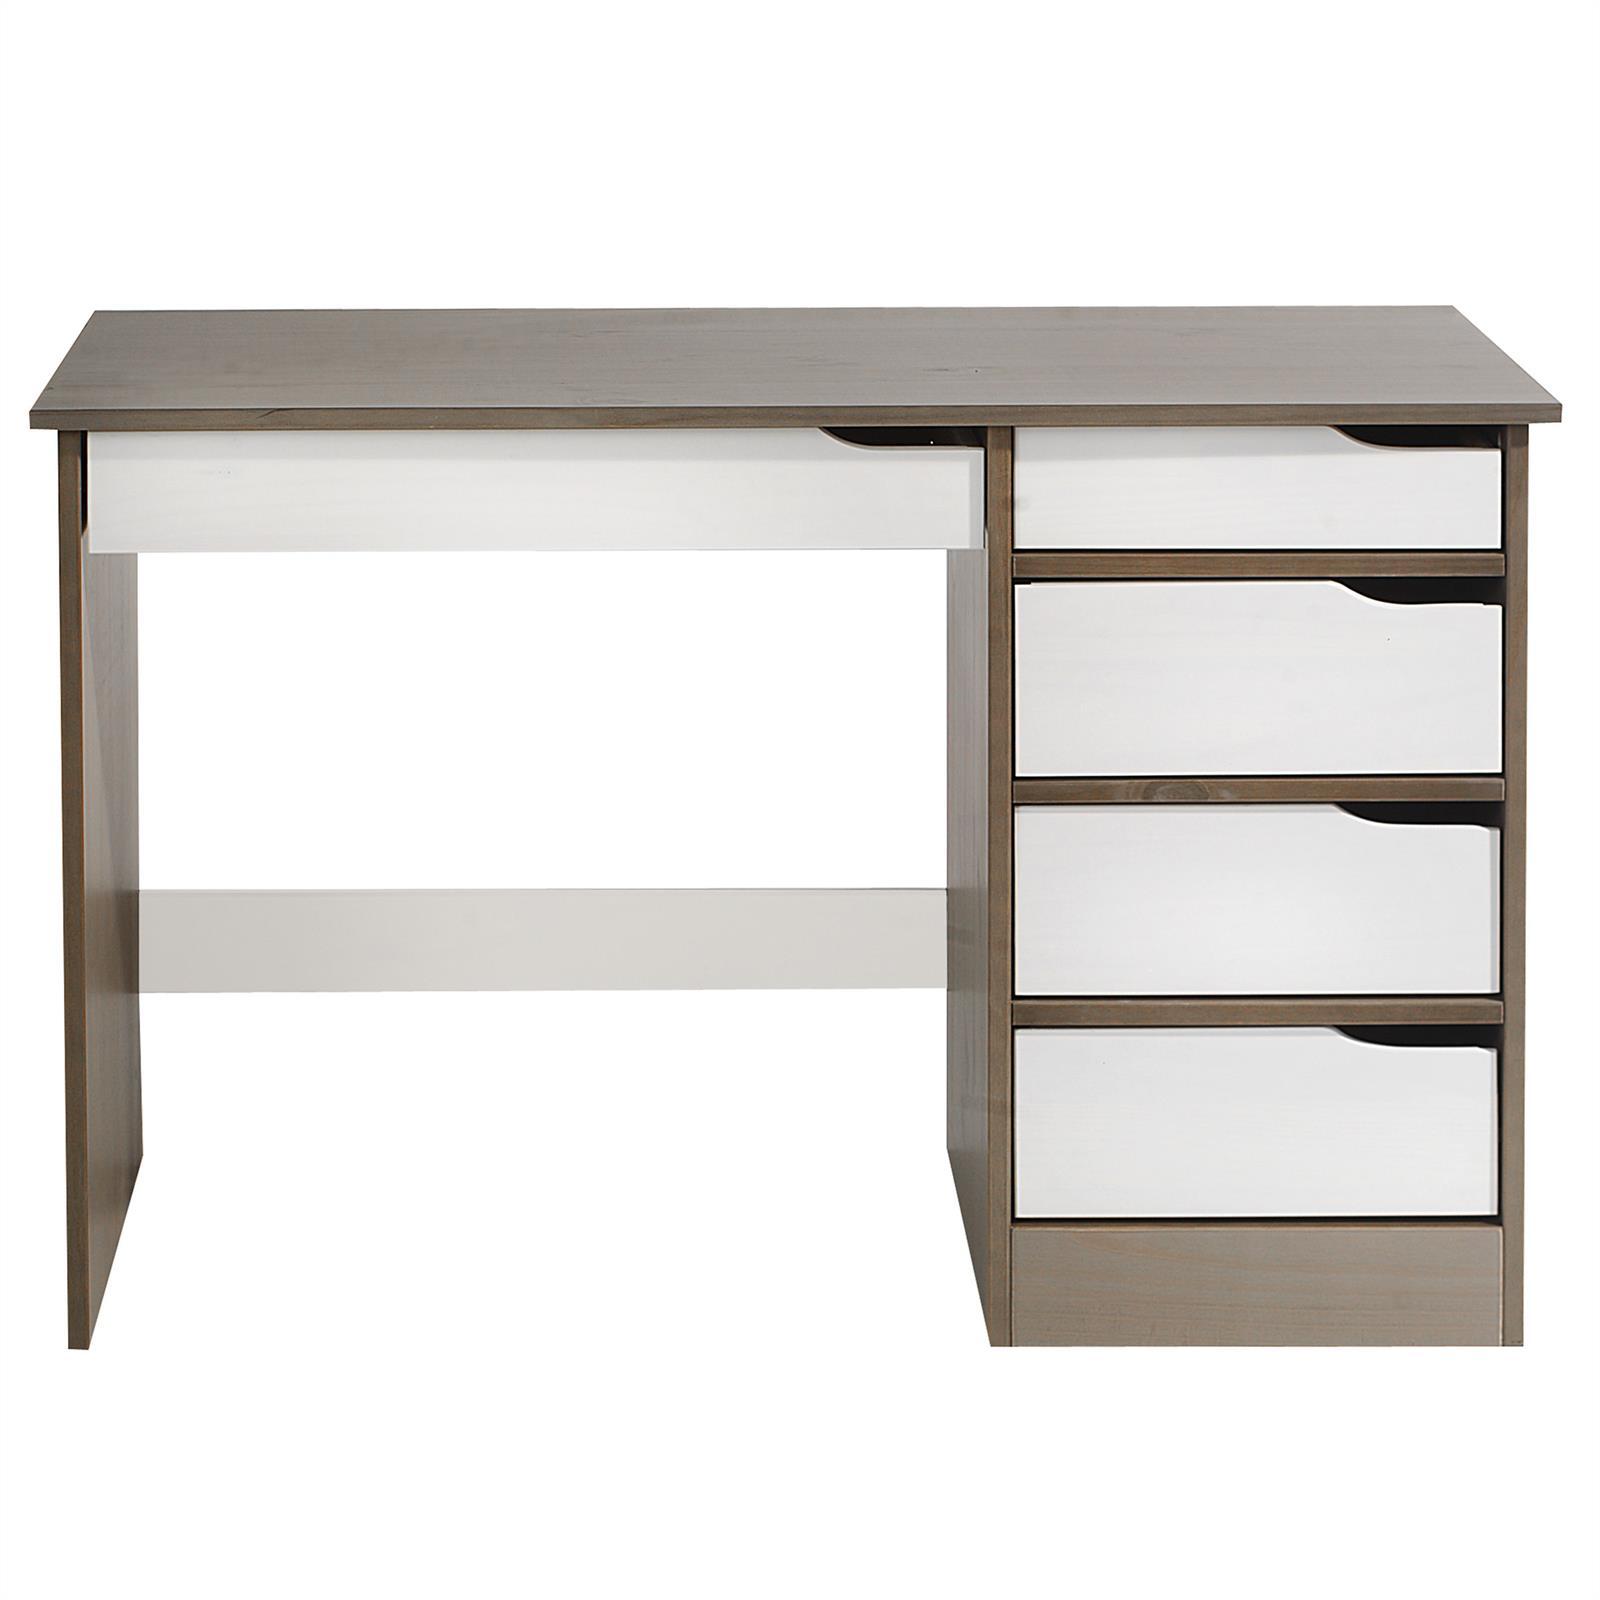 bureau en pin massif hugo lasur taupe et blanc mobil meubles. Black Bedroom Furniture Sets. Home Design Ideas